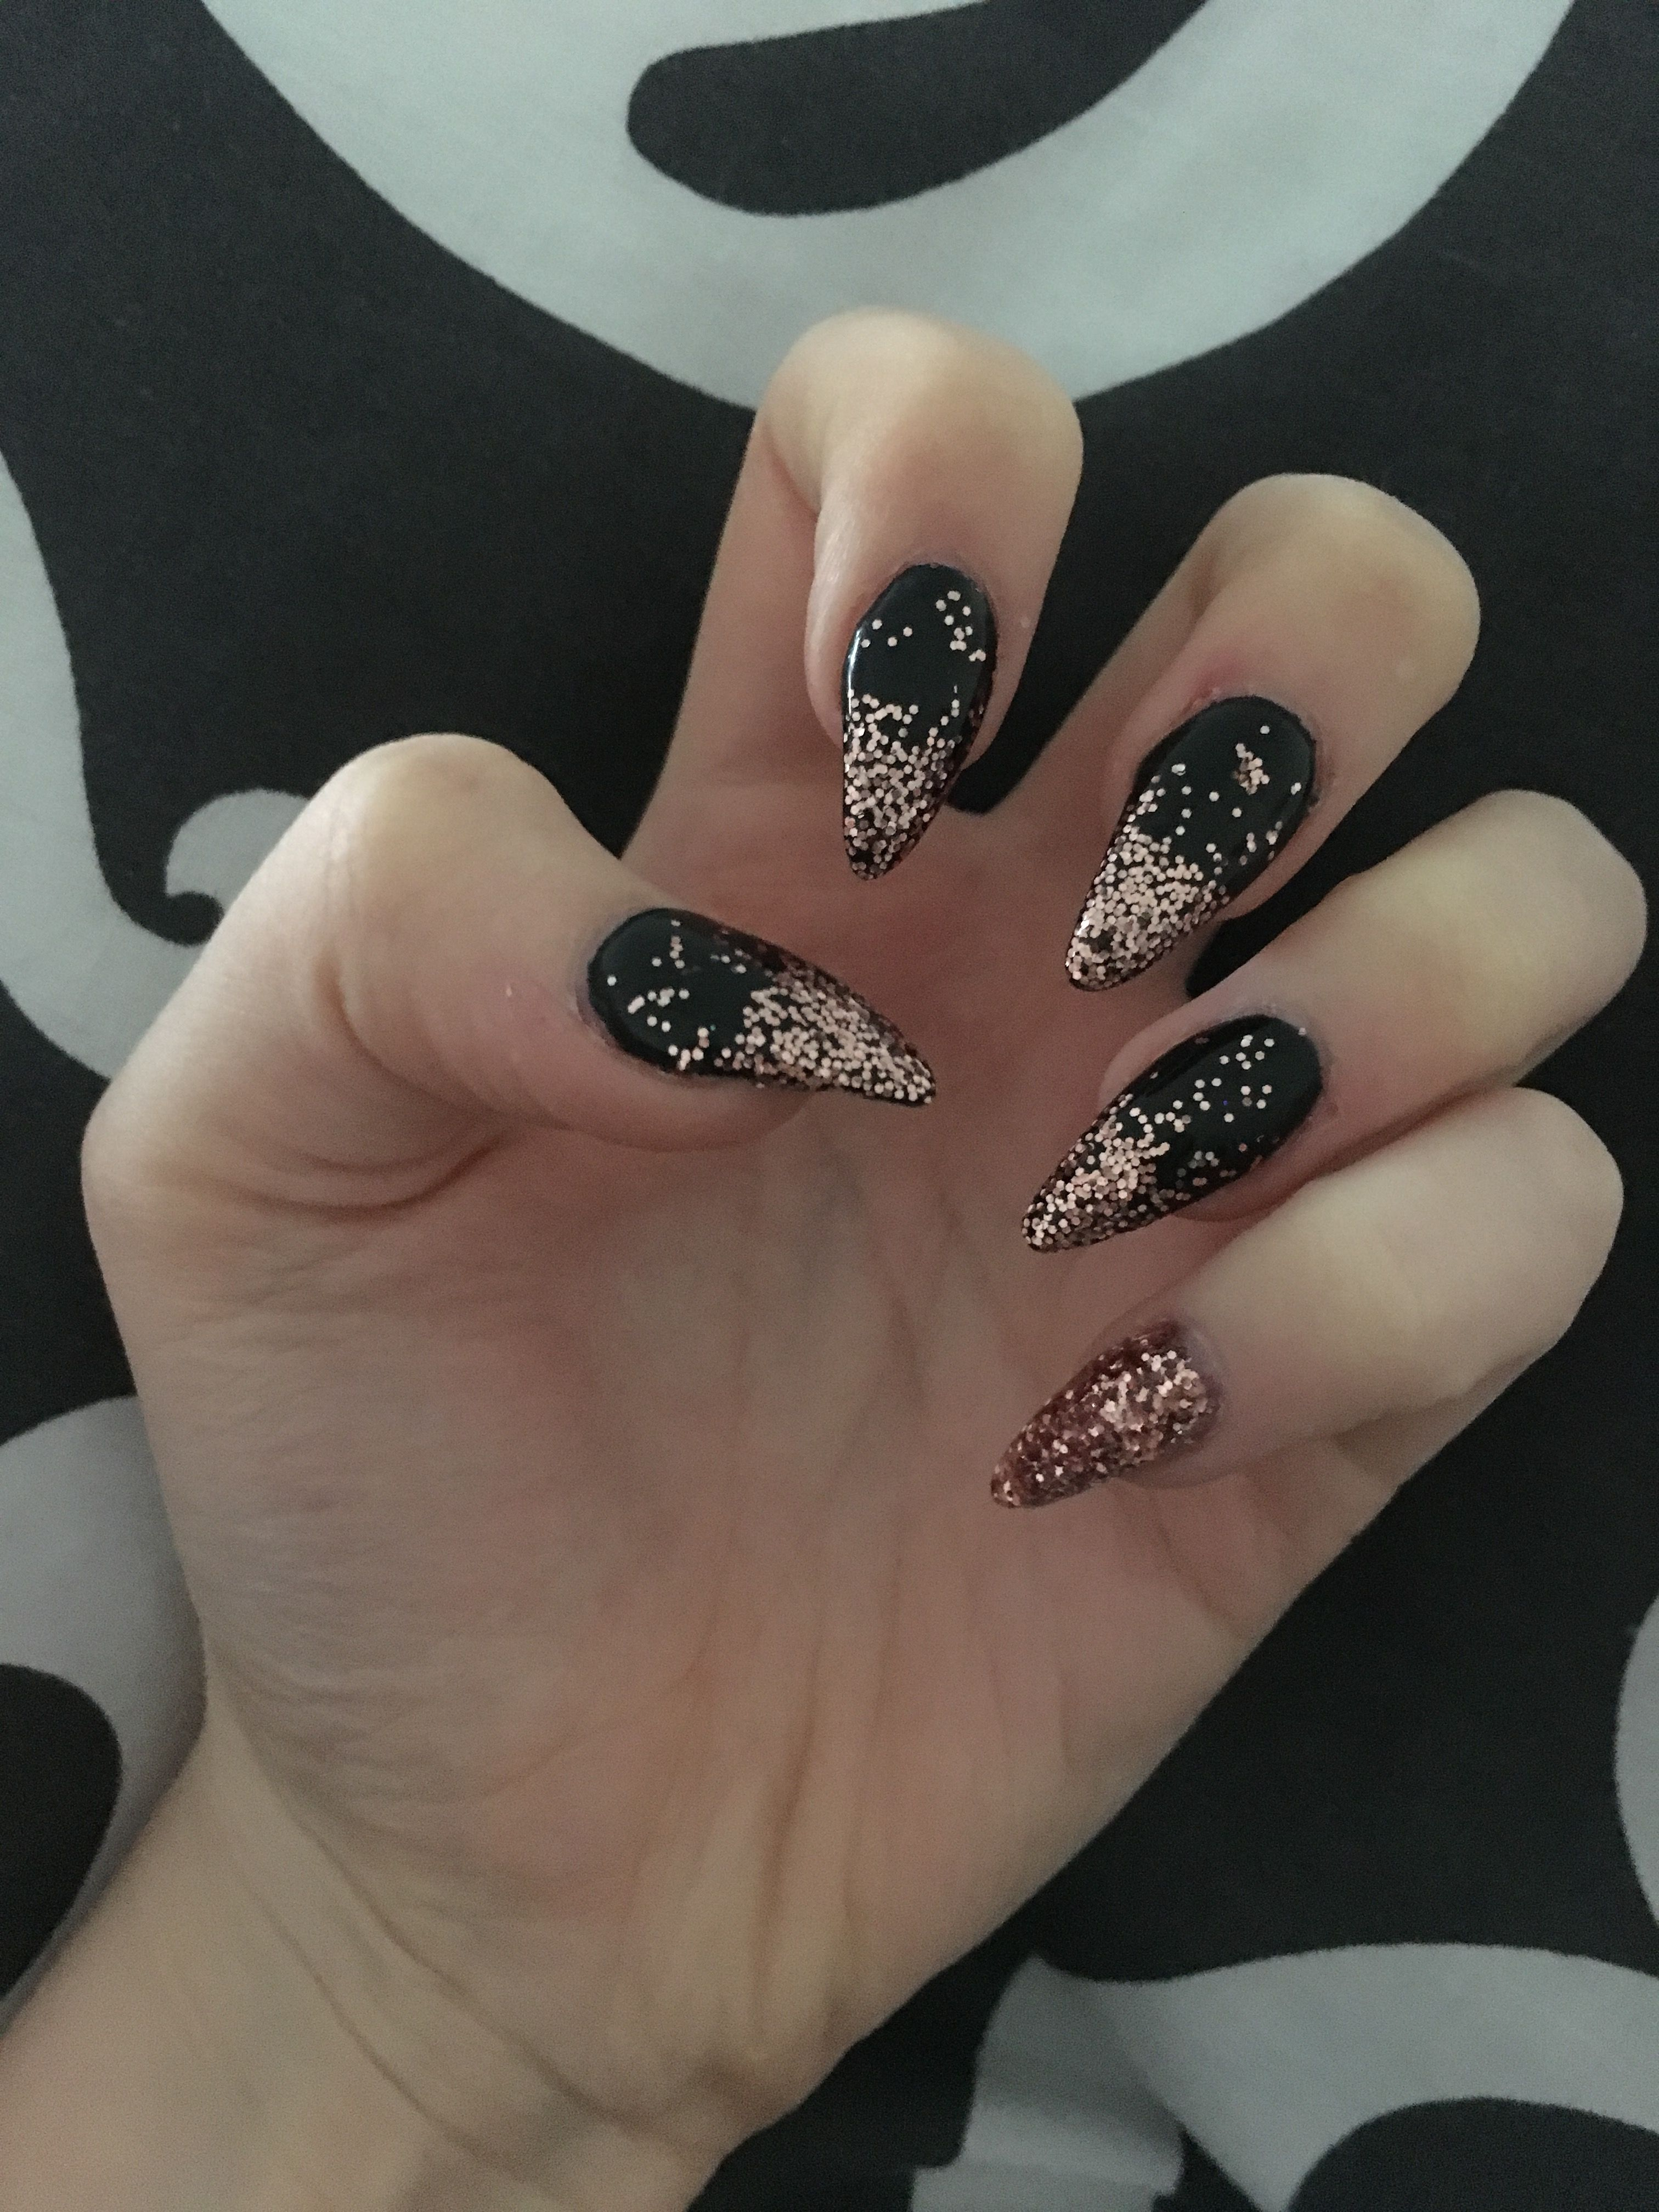 Gold and black stiletto nails photos